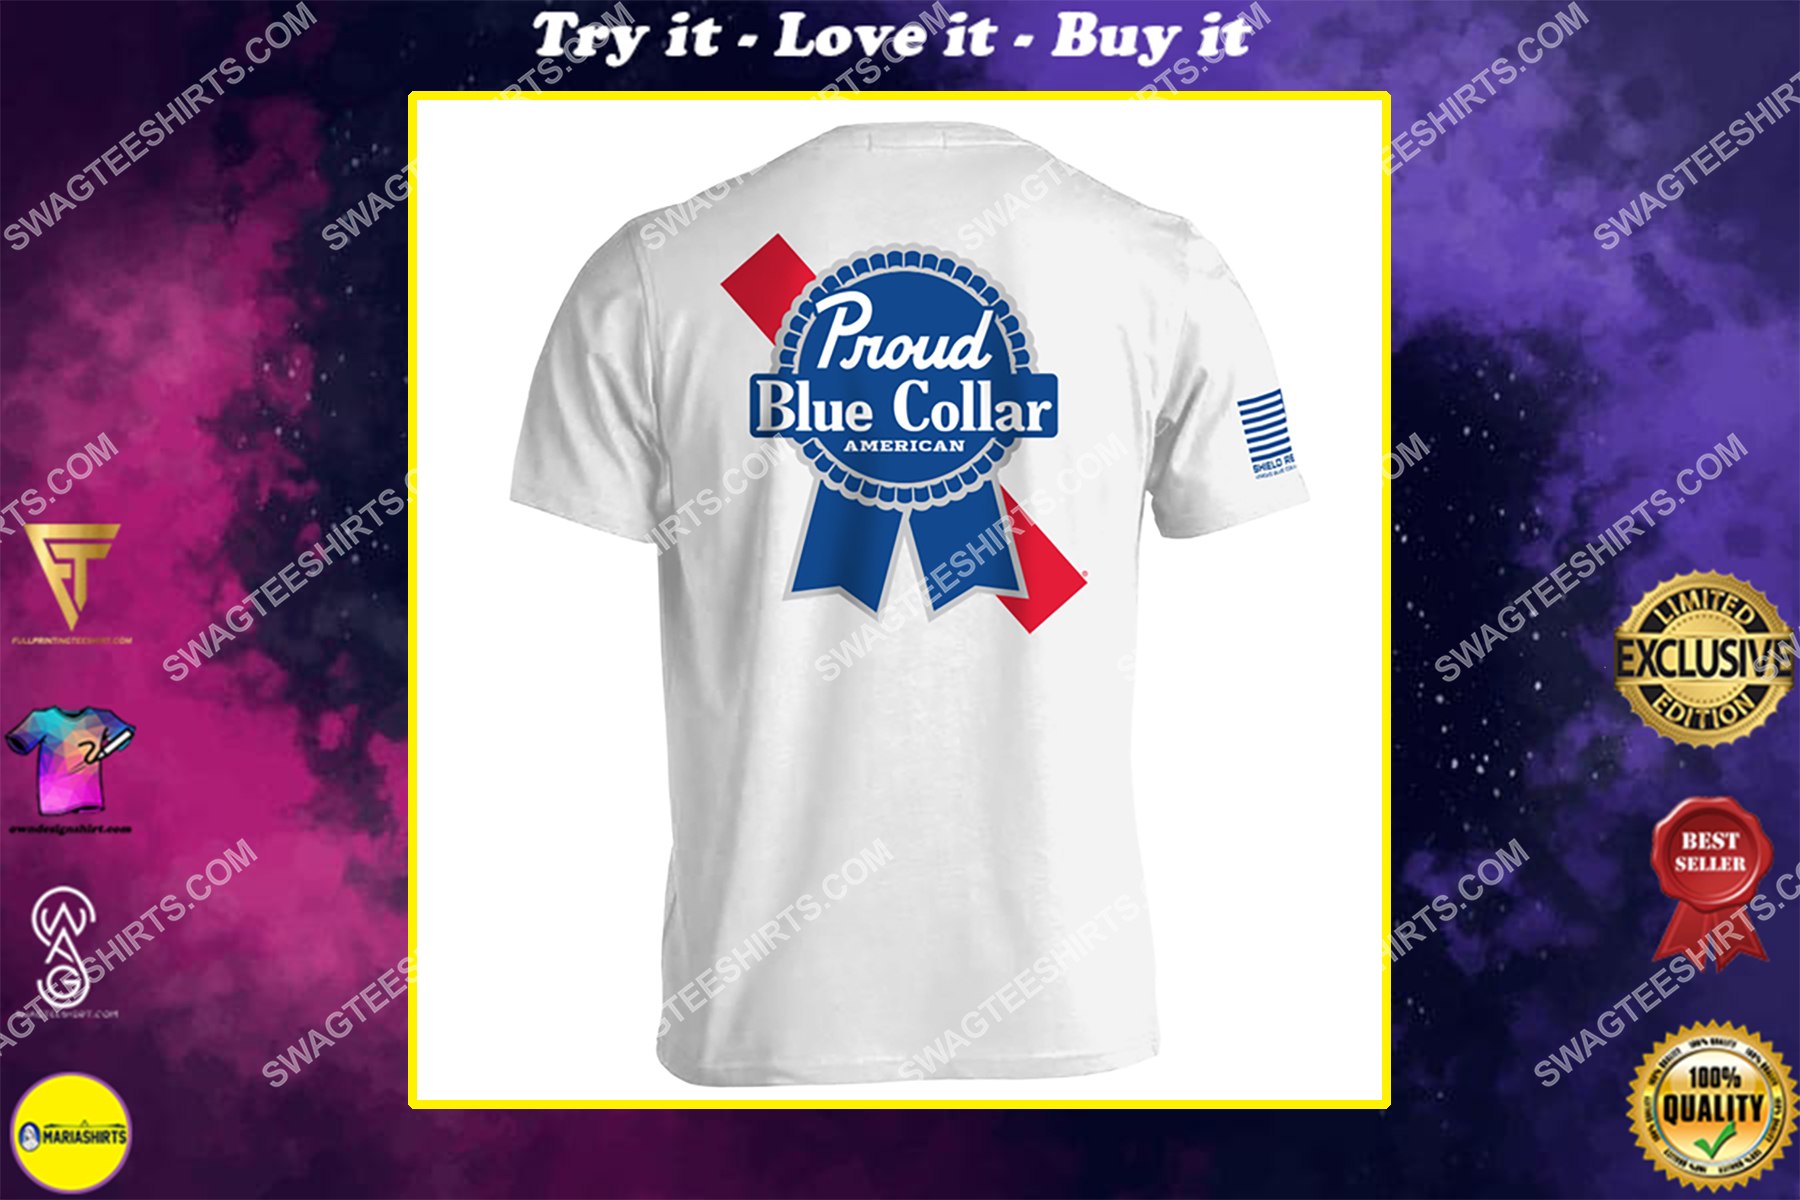 proud blue collar american political shirt